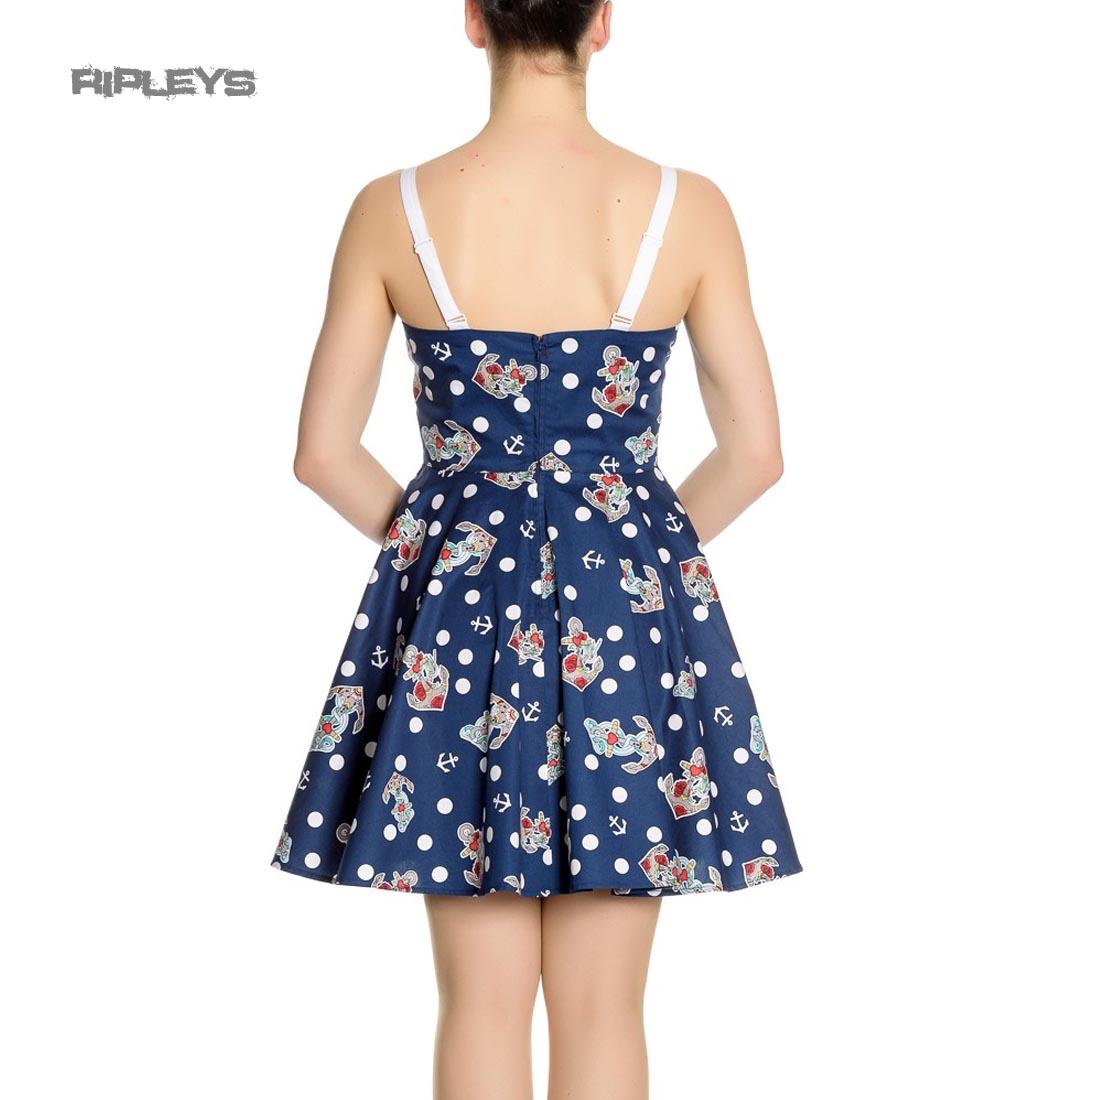 Hell-Bunny-Navy-Blue-50s-Nautical-Mini-Dress-OCEANA-Polka-Dot-All-Sizes thumbnail 8